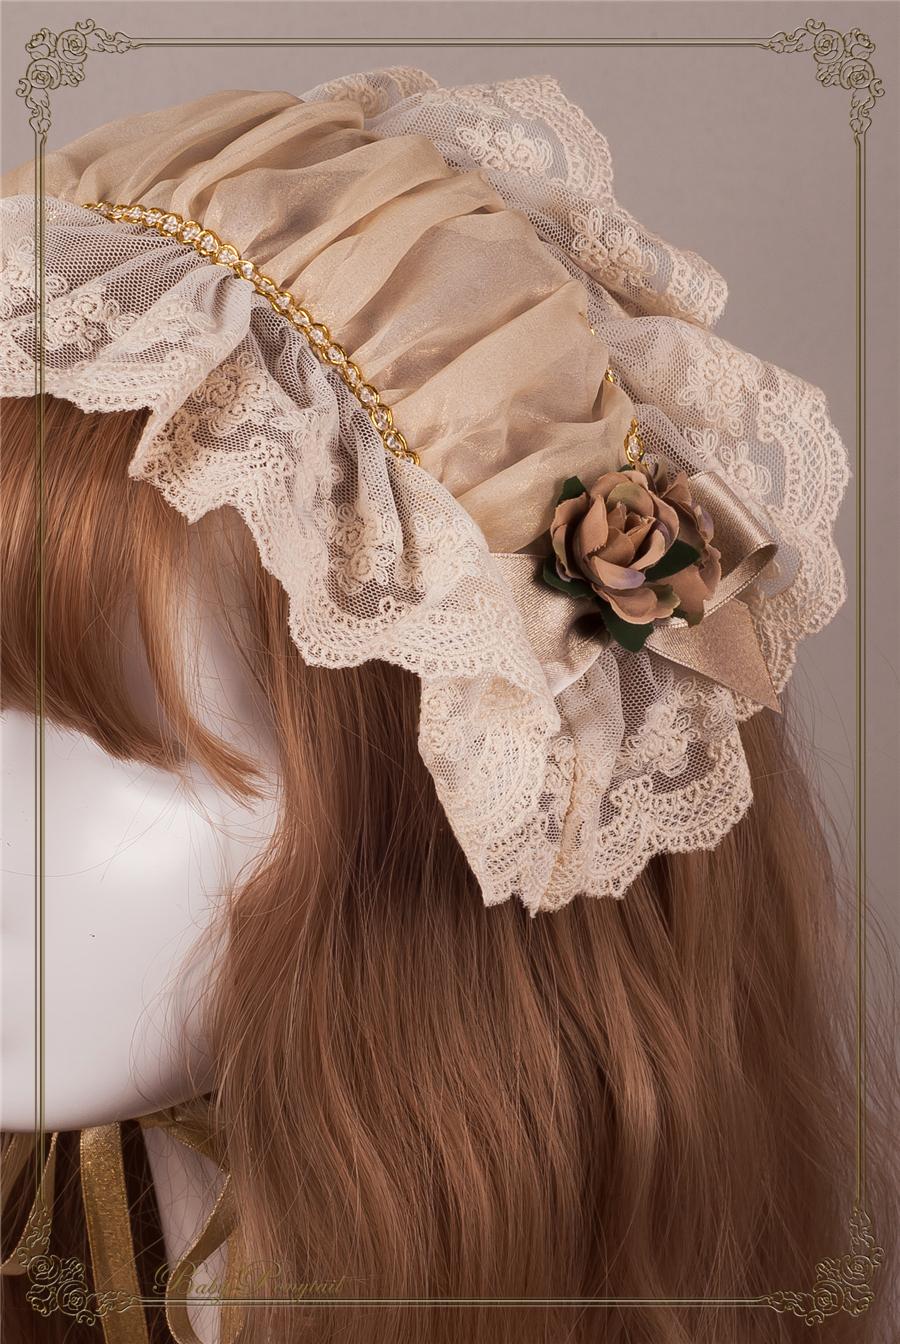 BabyPonytail_Rose Battle_Stock Photo_Petite Rose Head Dress Amber_8.jpg